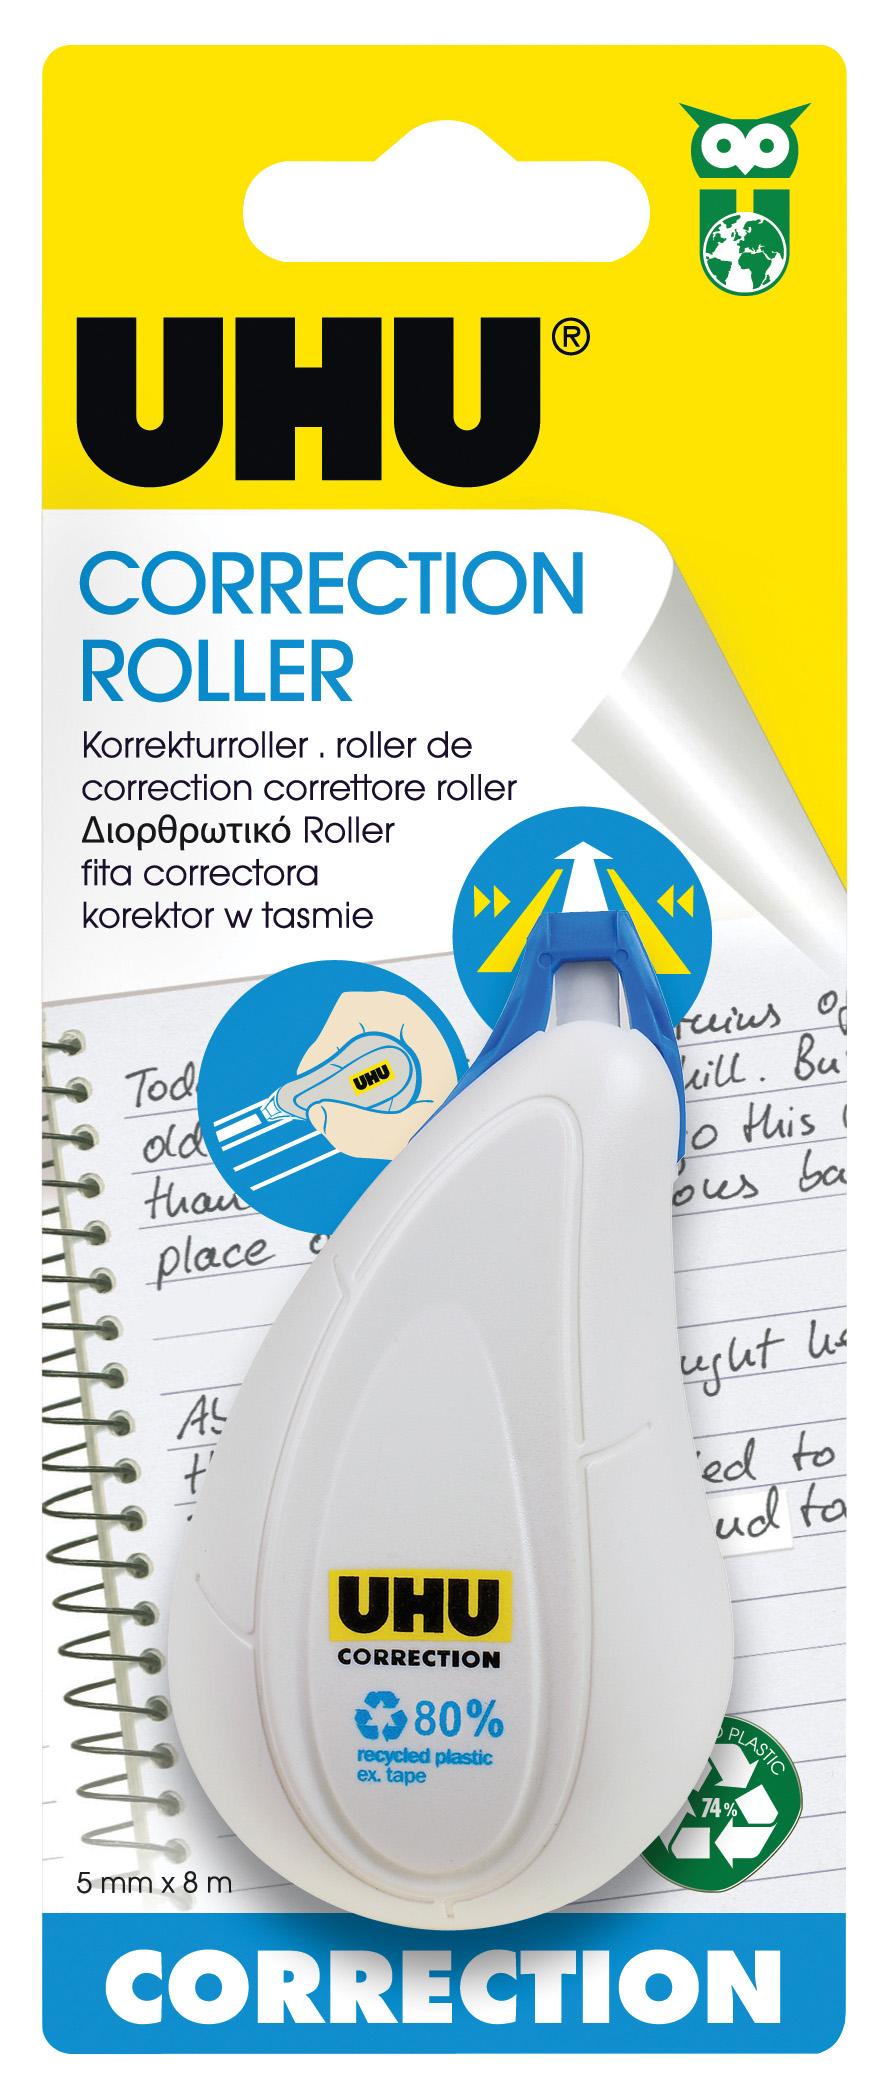 UHU Correction Roller Sideway Korrektur-Roller Infokarte 5mm x 8m